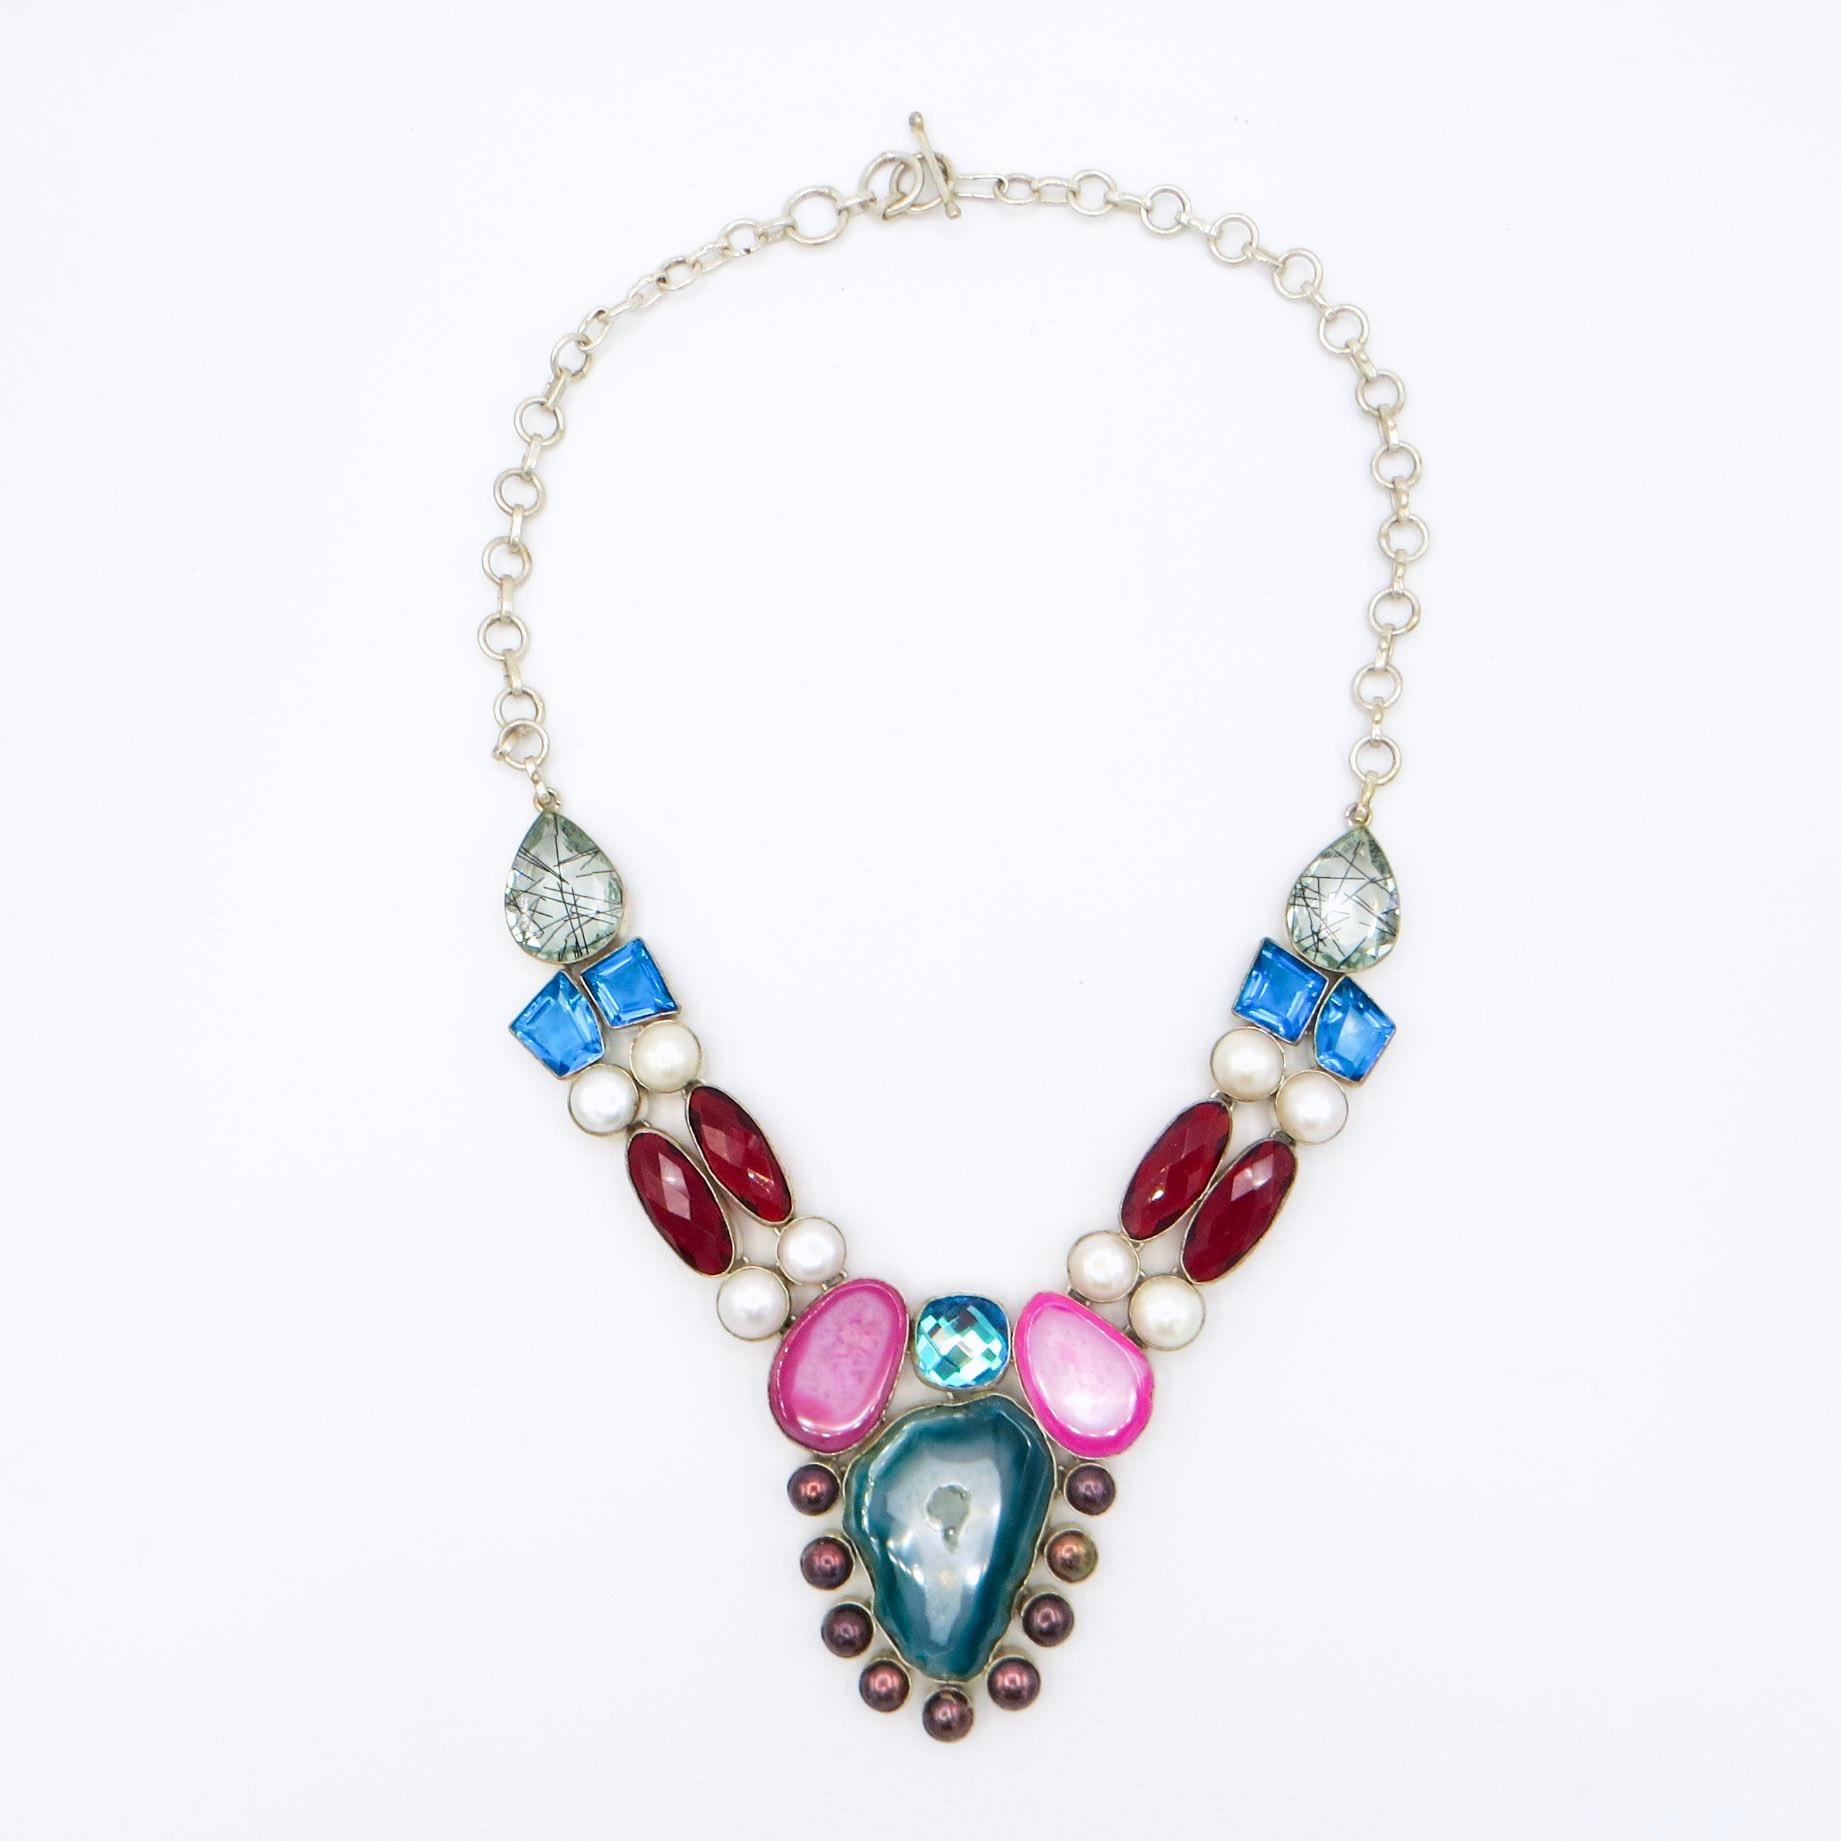 Pearl Quartz & Agate Necklace